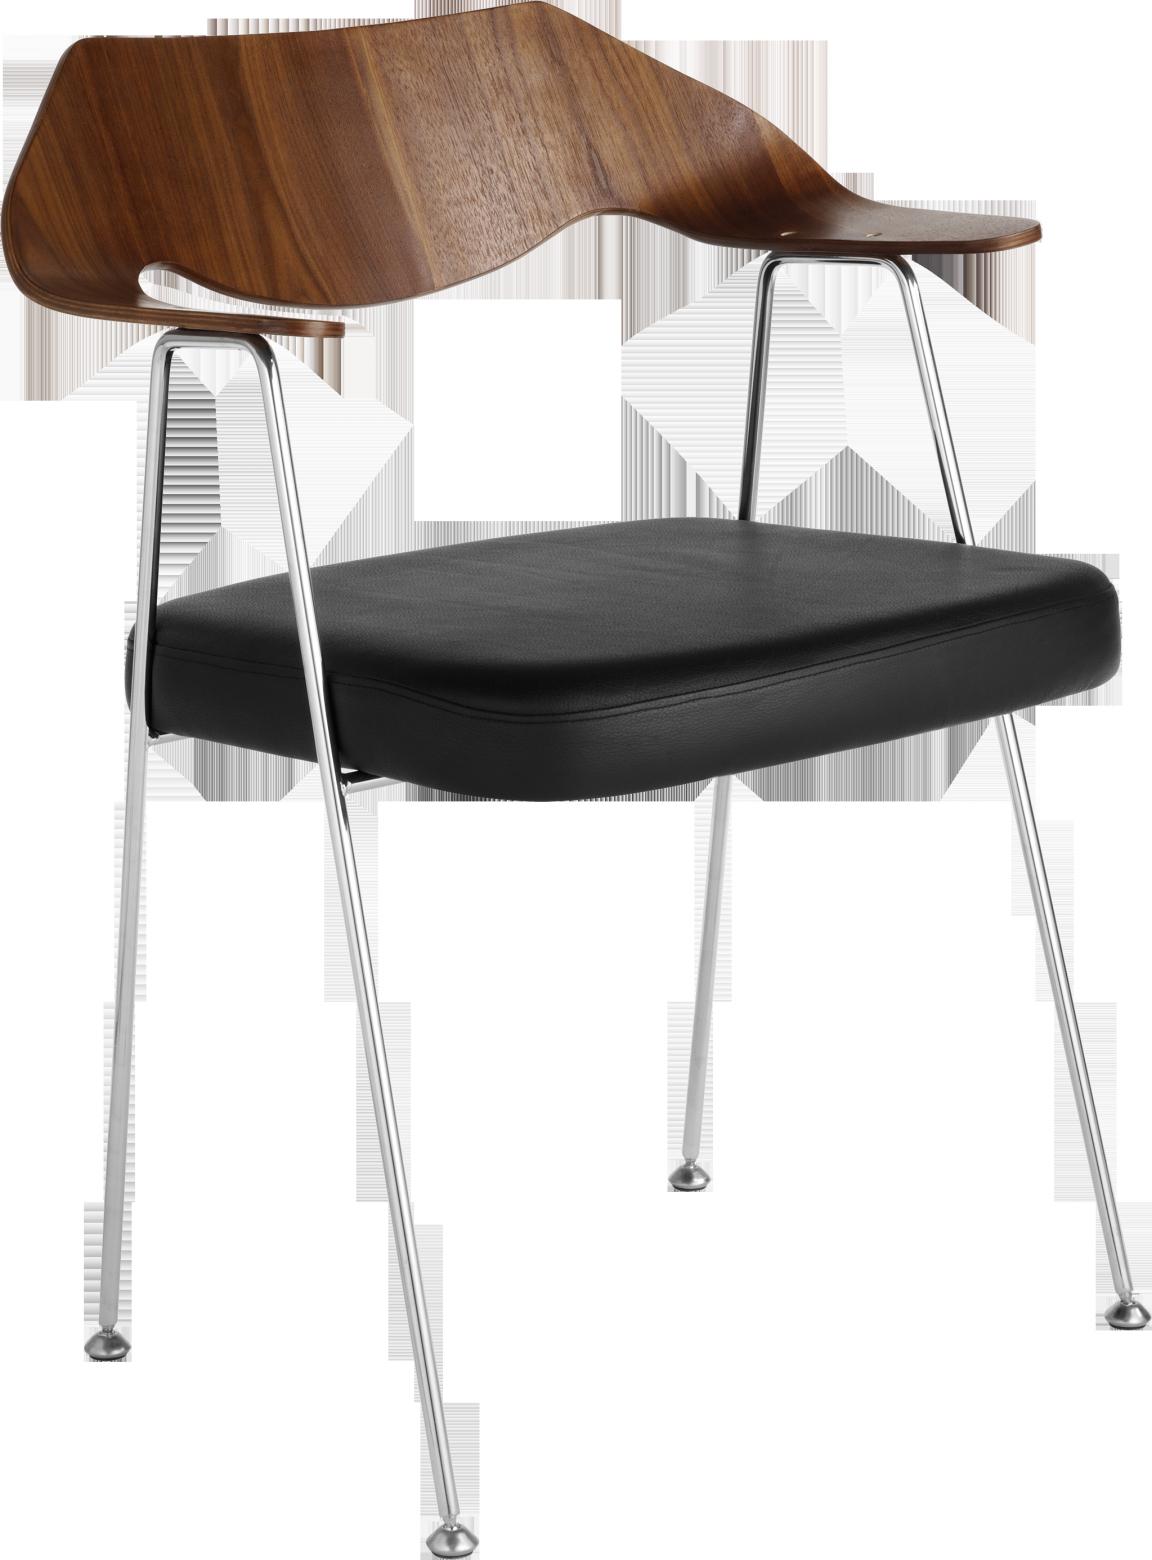 habitat chaise de bureau elegant bureau with habitat chaise de bureau excellent bureau habitat. Black Bedroom Furniture Sets. Home Design Ideas